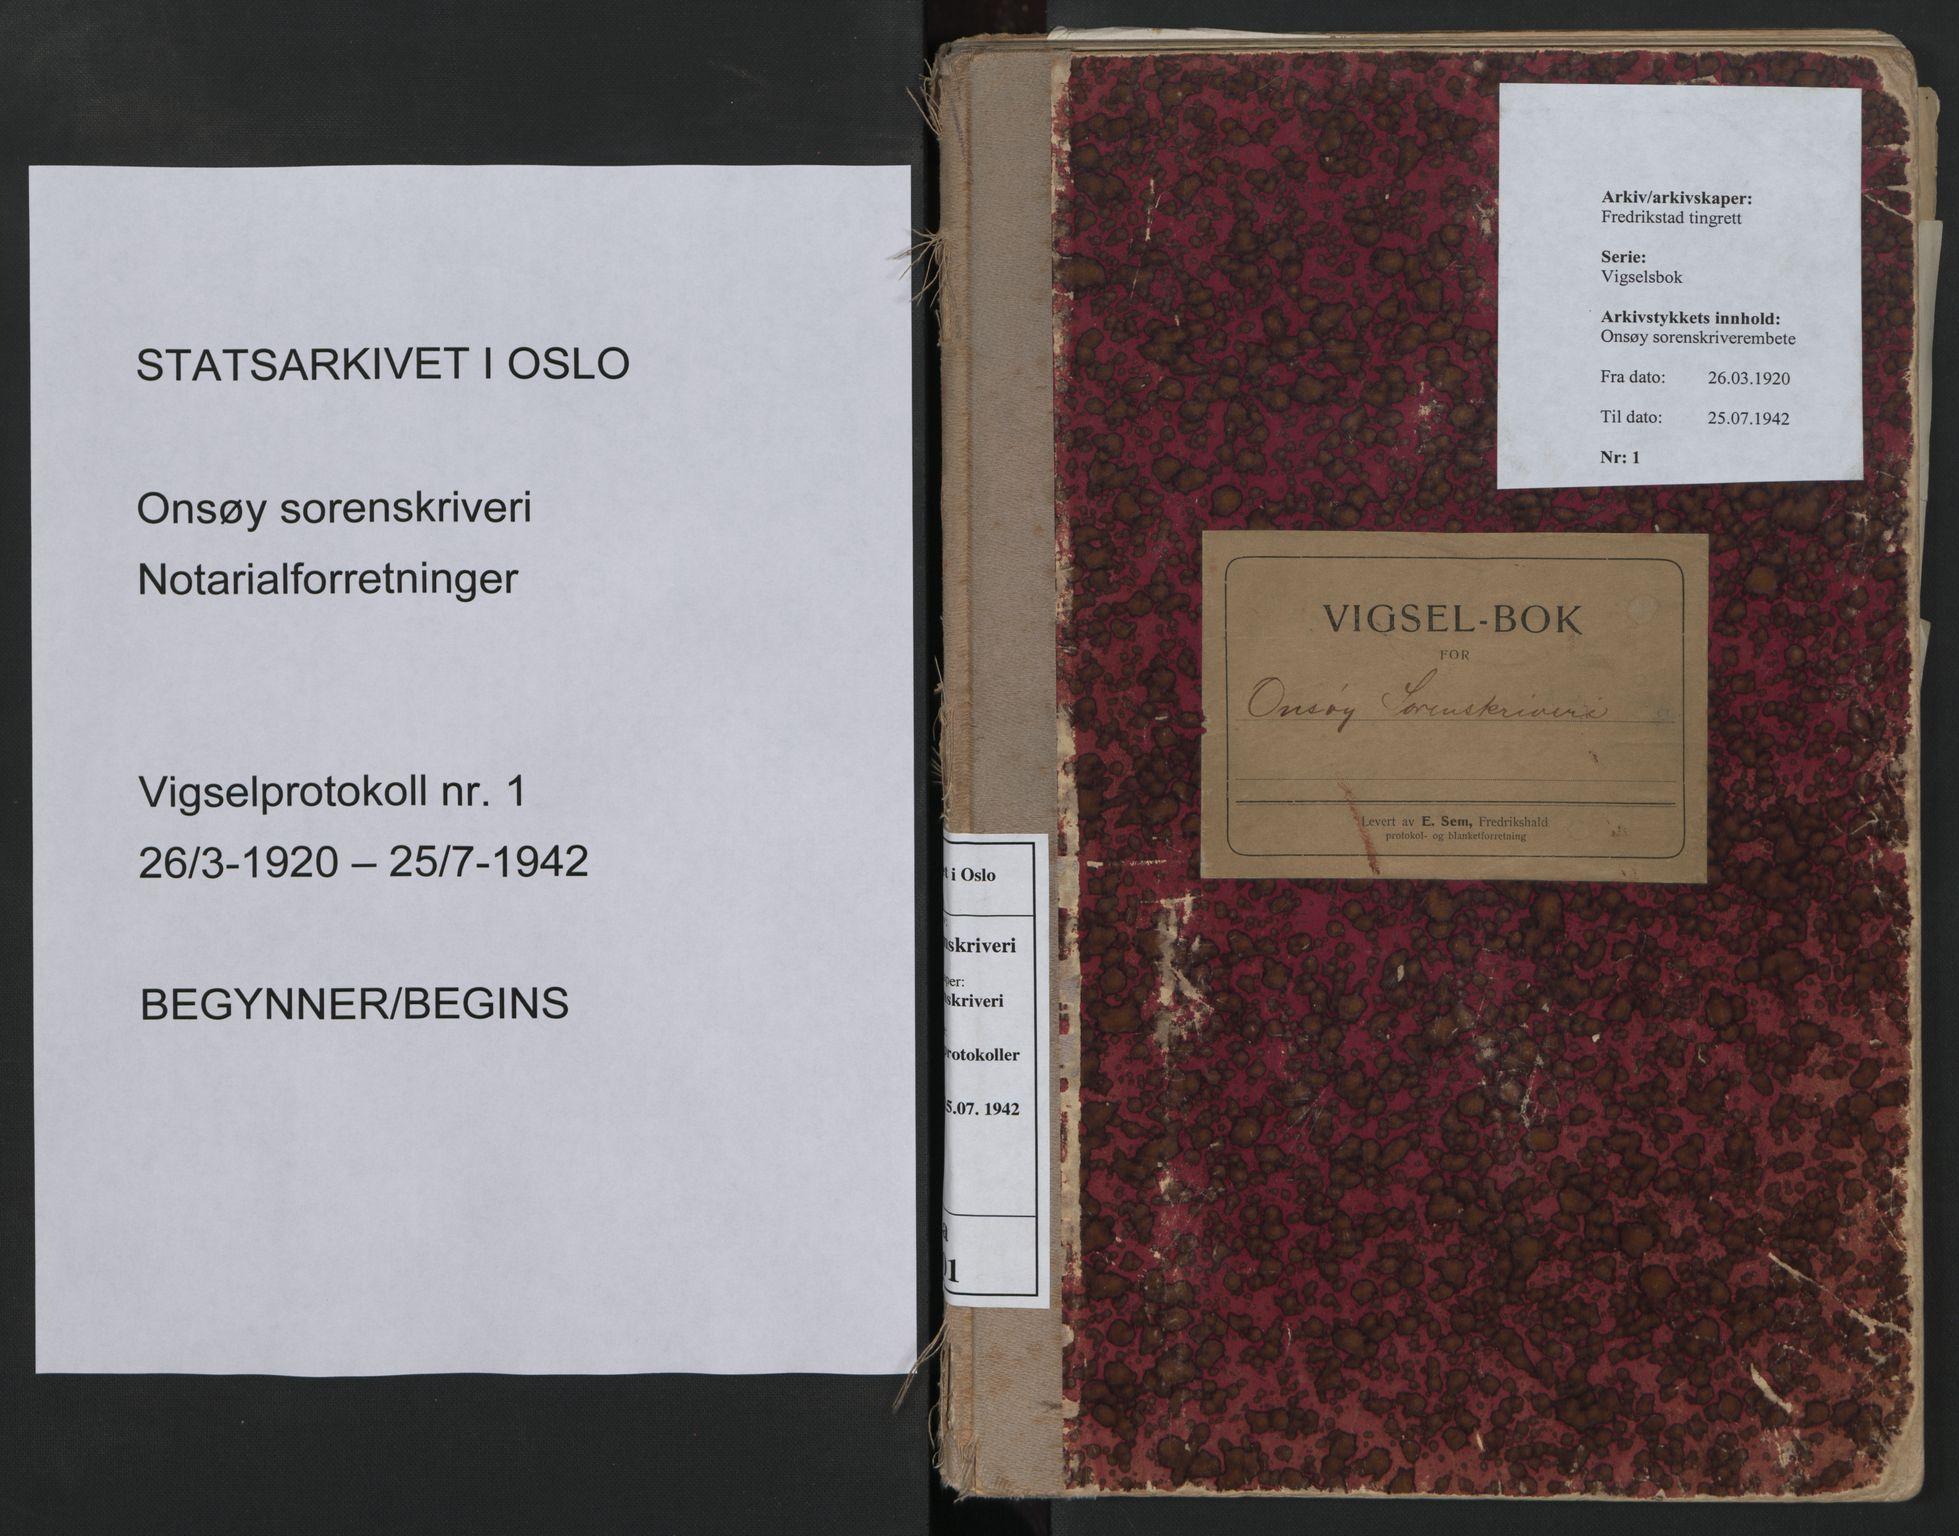 SAO, Onsøy sorenskriveri, L/La/L0001: Vigselsbok, 1920-1942, s. upaginert